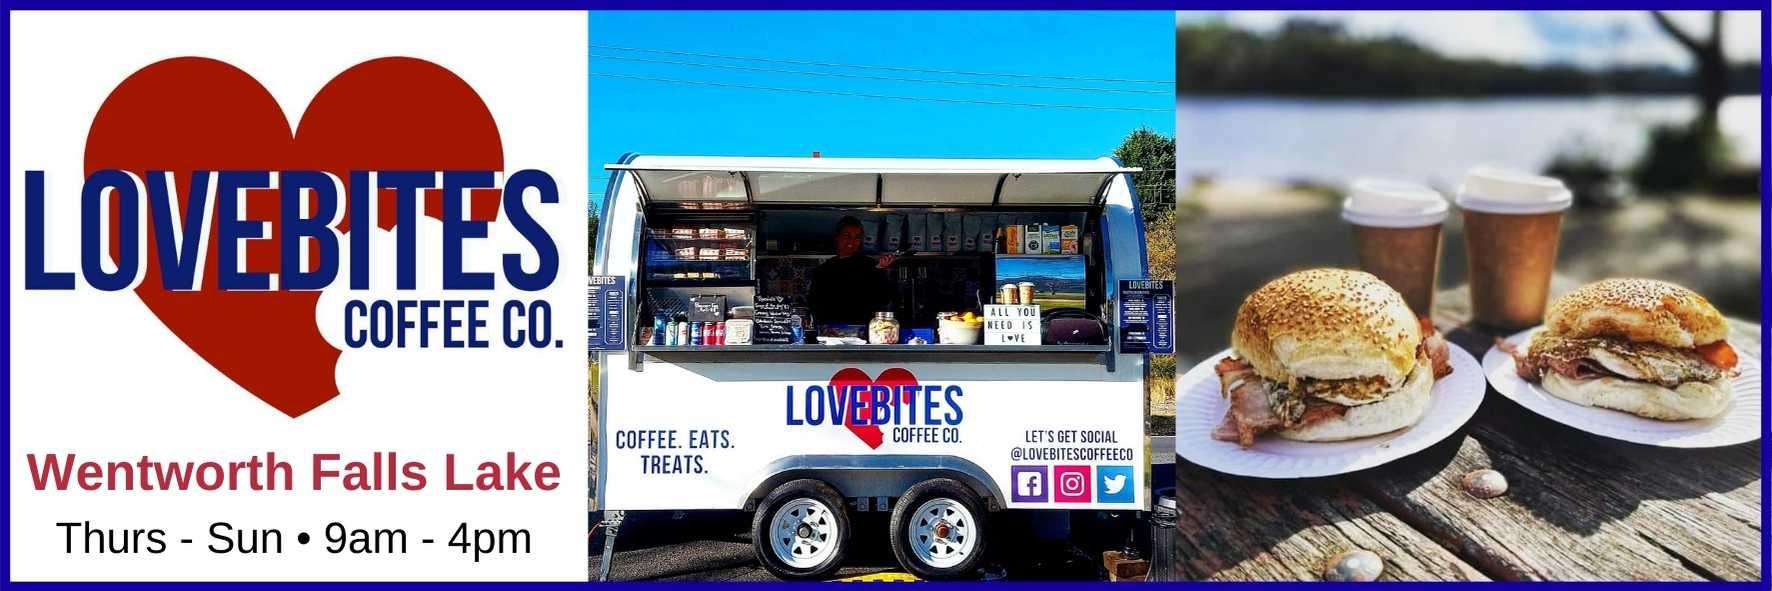 Lovebite Coffee Co., Wentworth Falls Lake